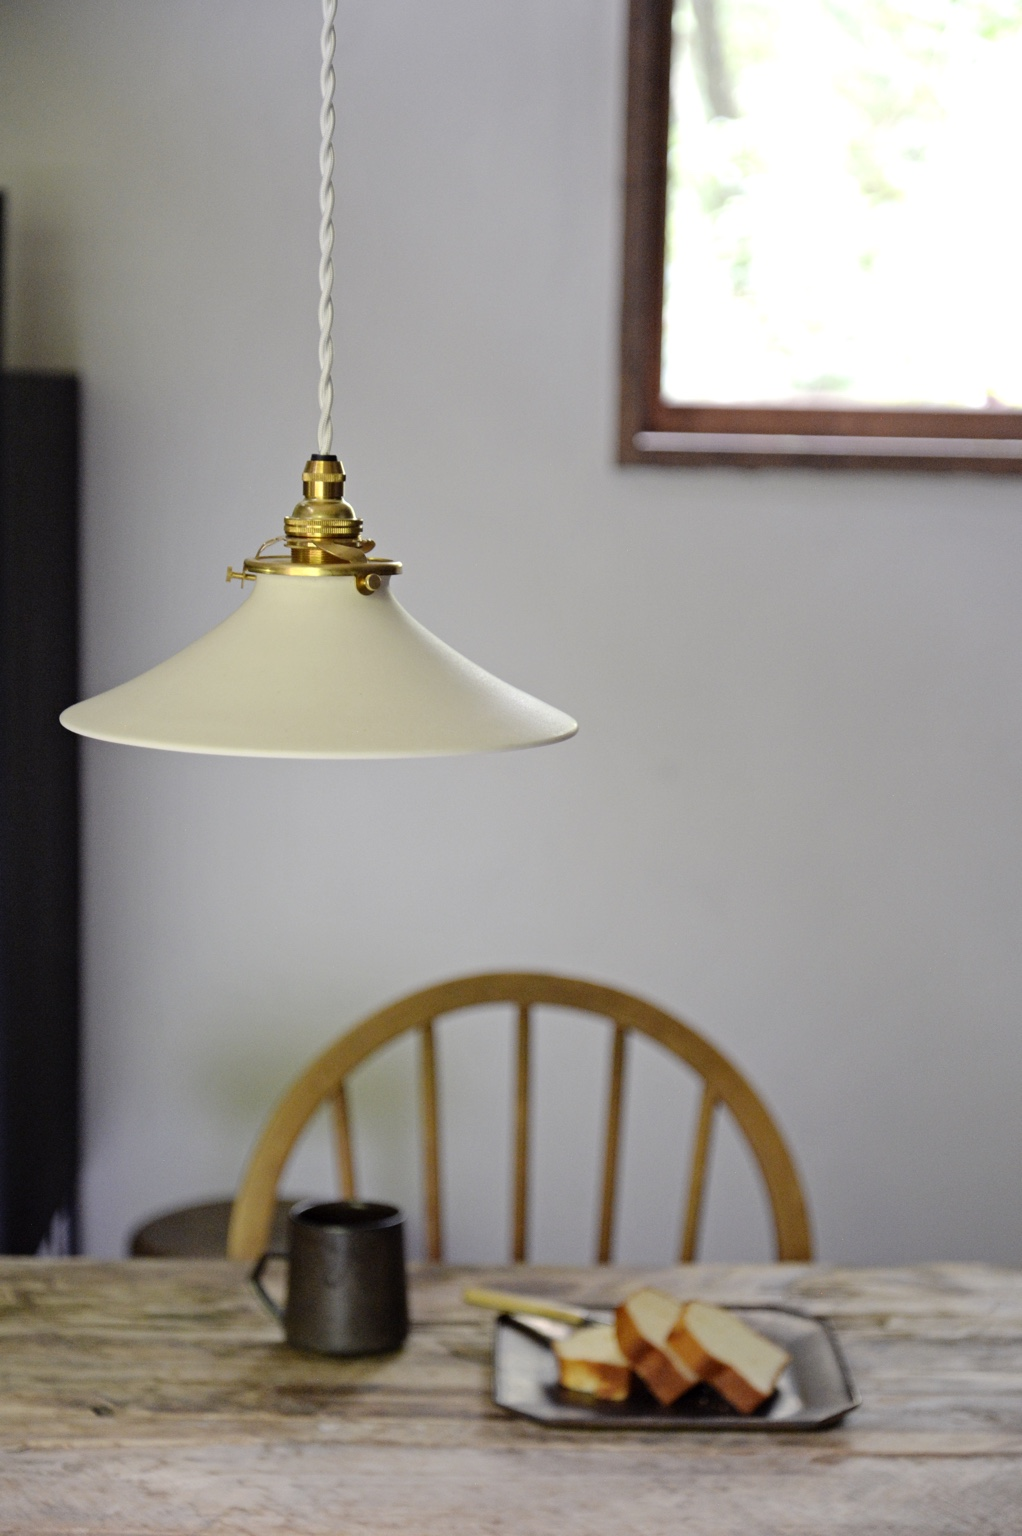 måne lamp ルーフ・ホワイト